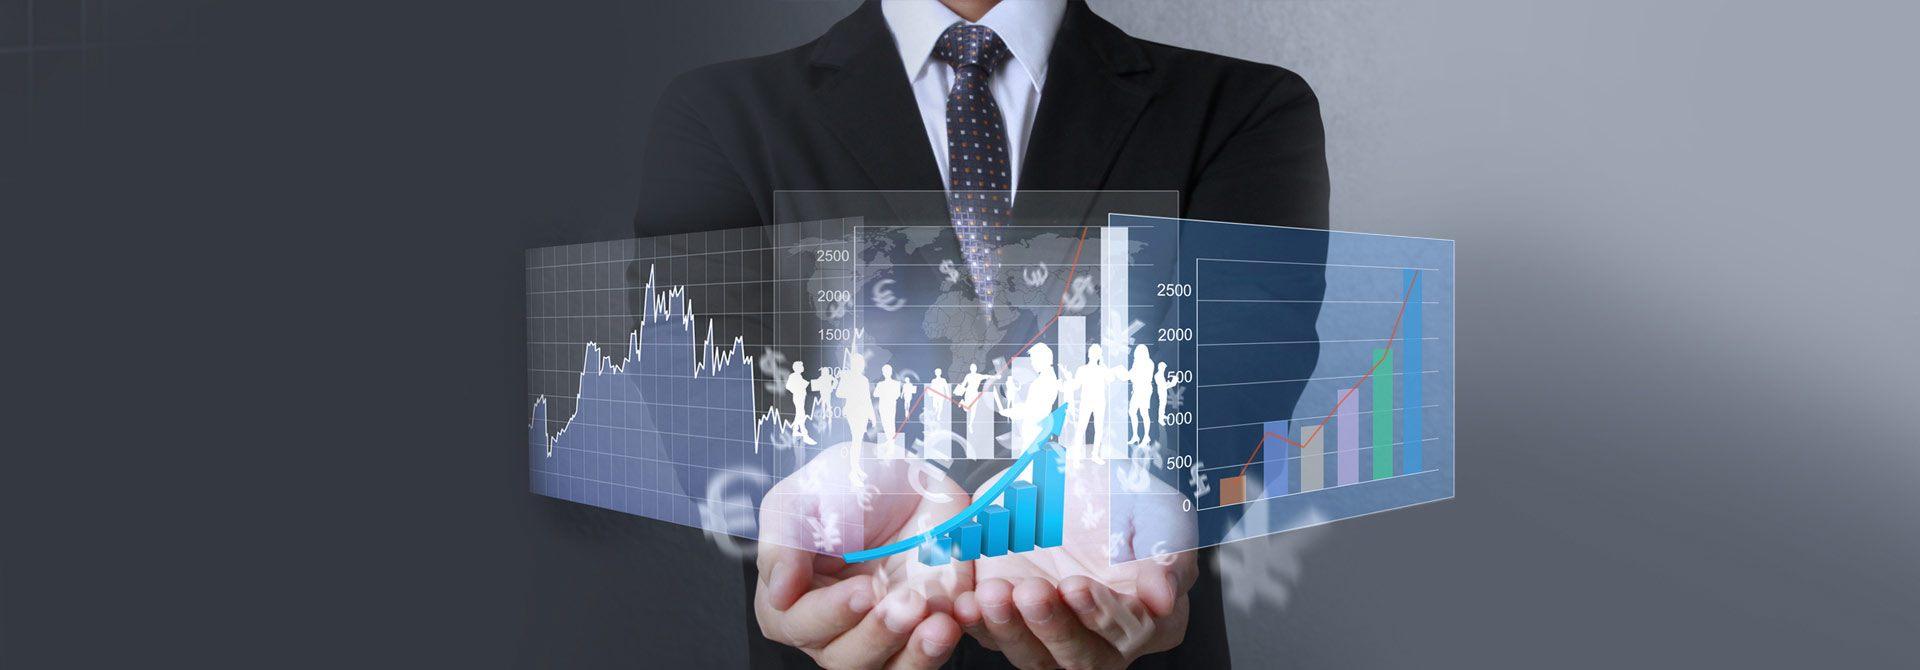 Disruptive Technologies transforming Manufacturing